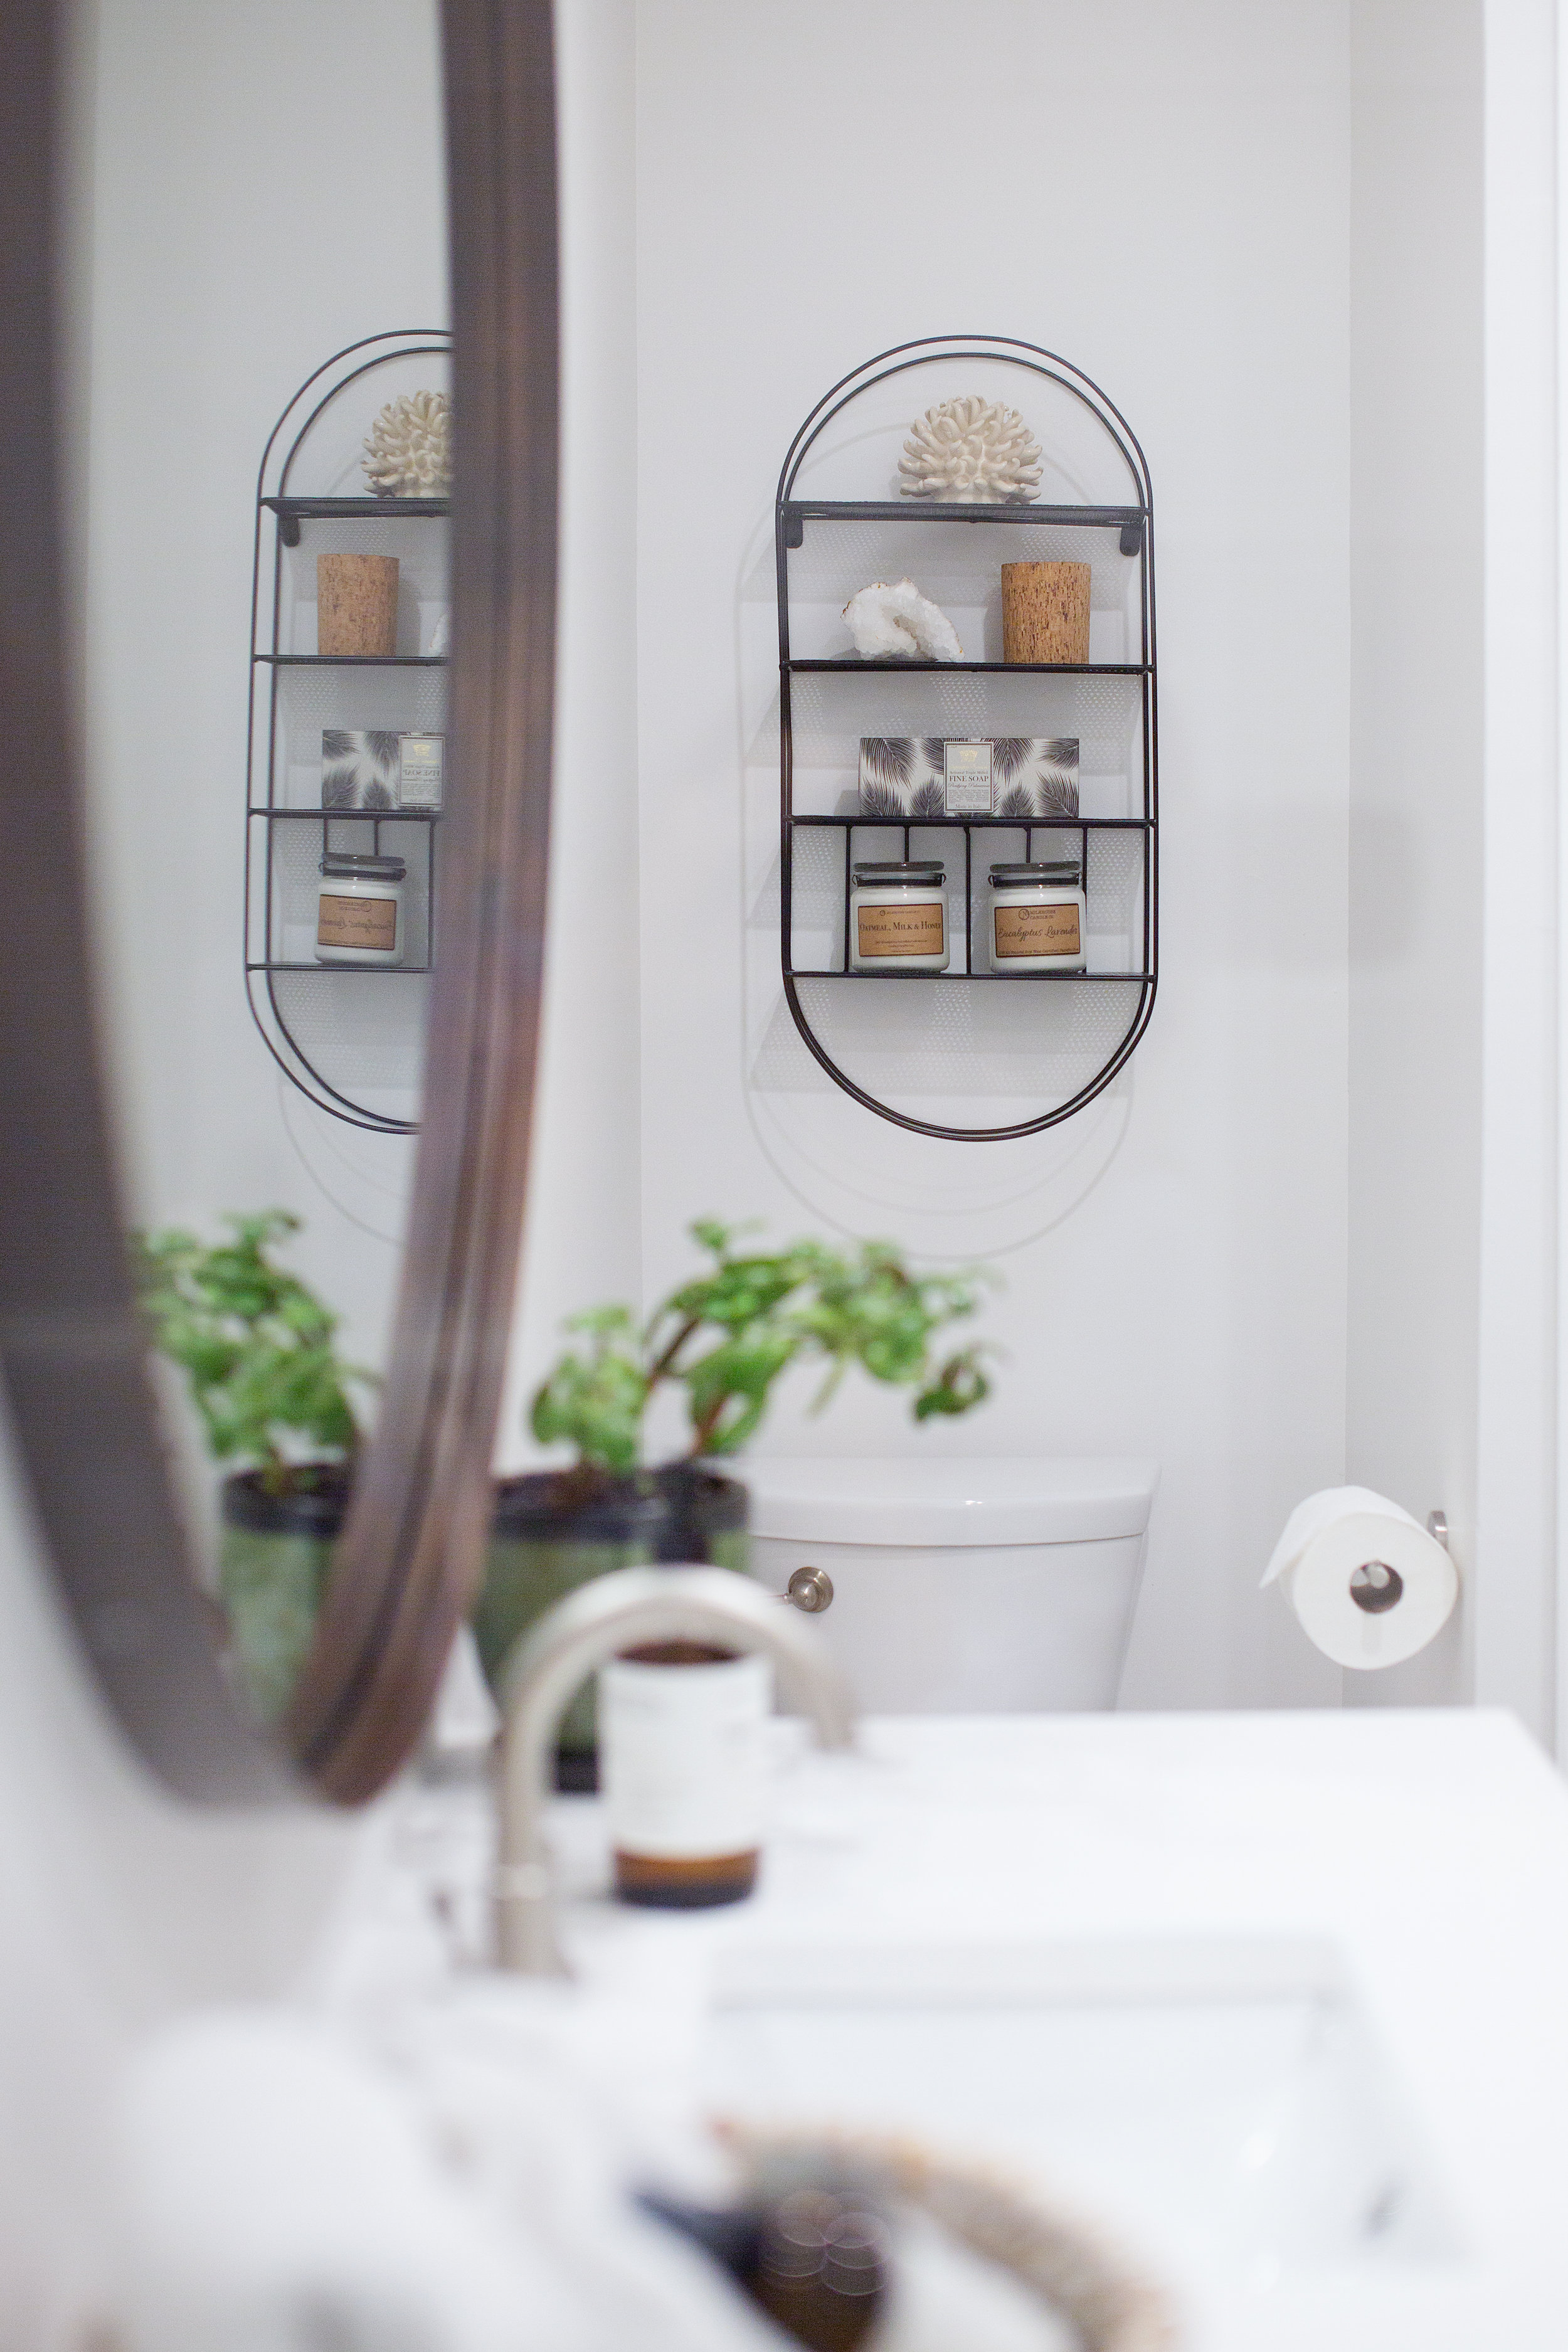 Metal shelving above toilet in guest bathroom